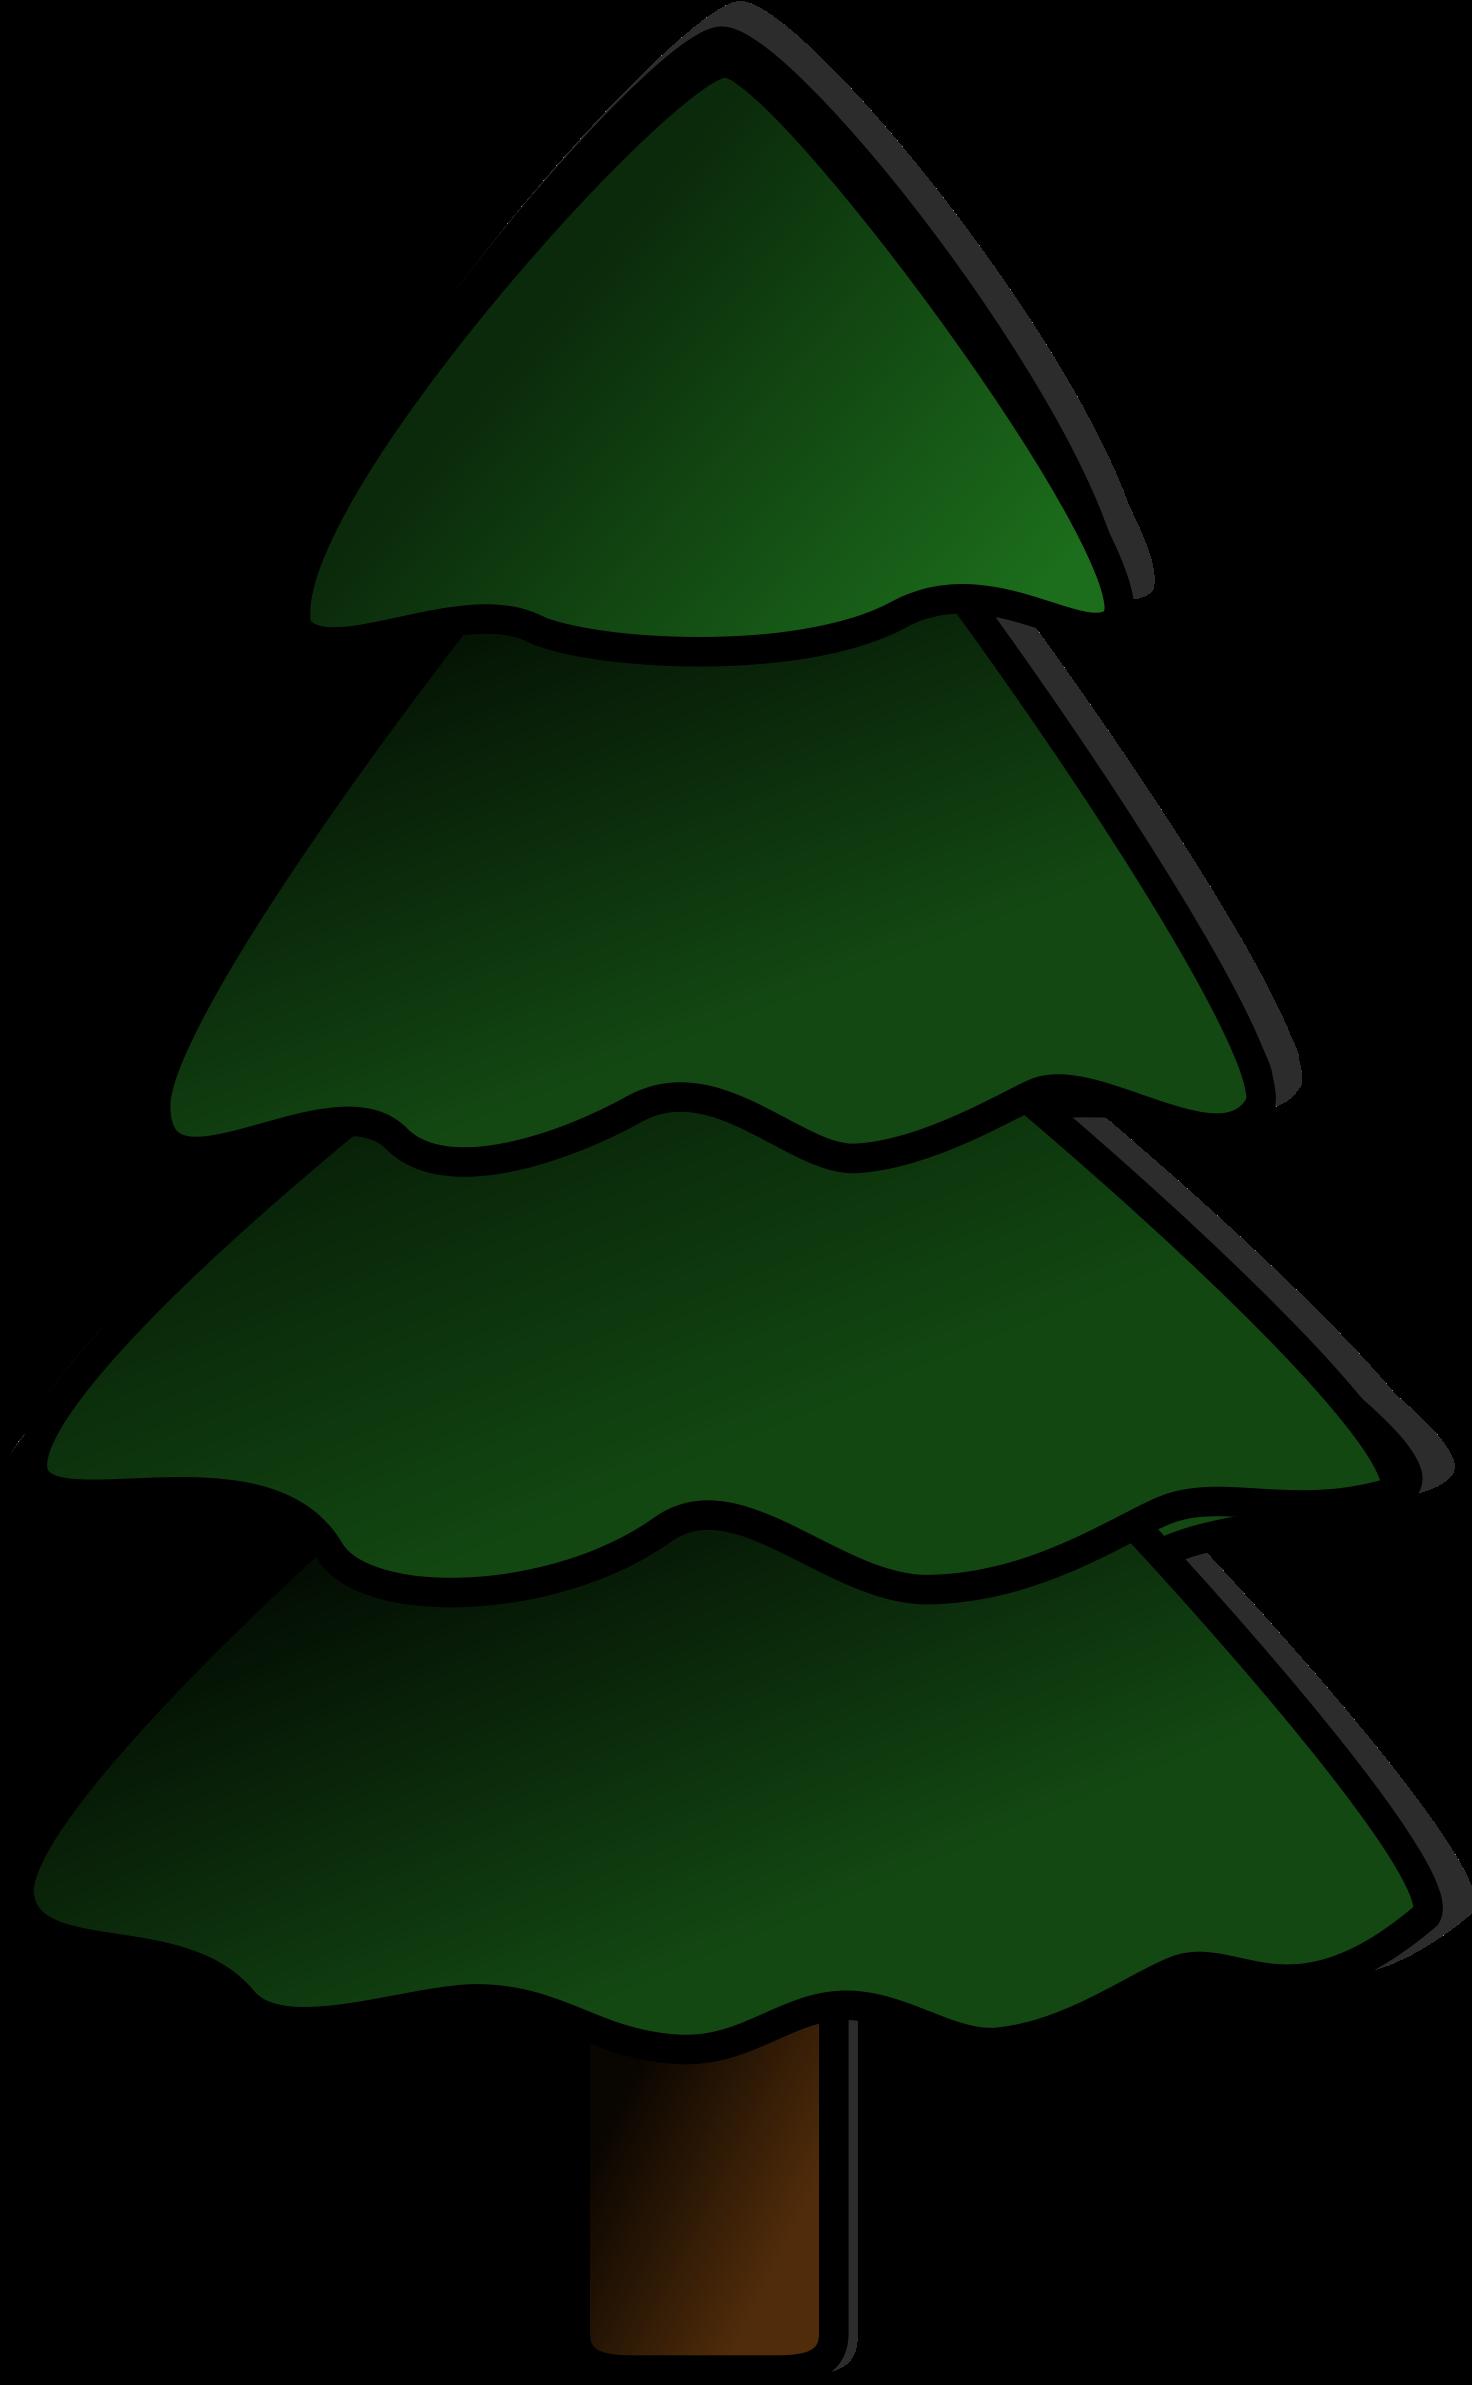 Transparent tree clip art - Pine Tree Clip Art - Simple Pine Tree Clipart